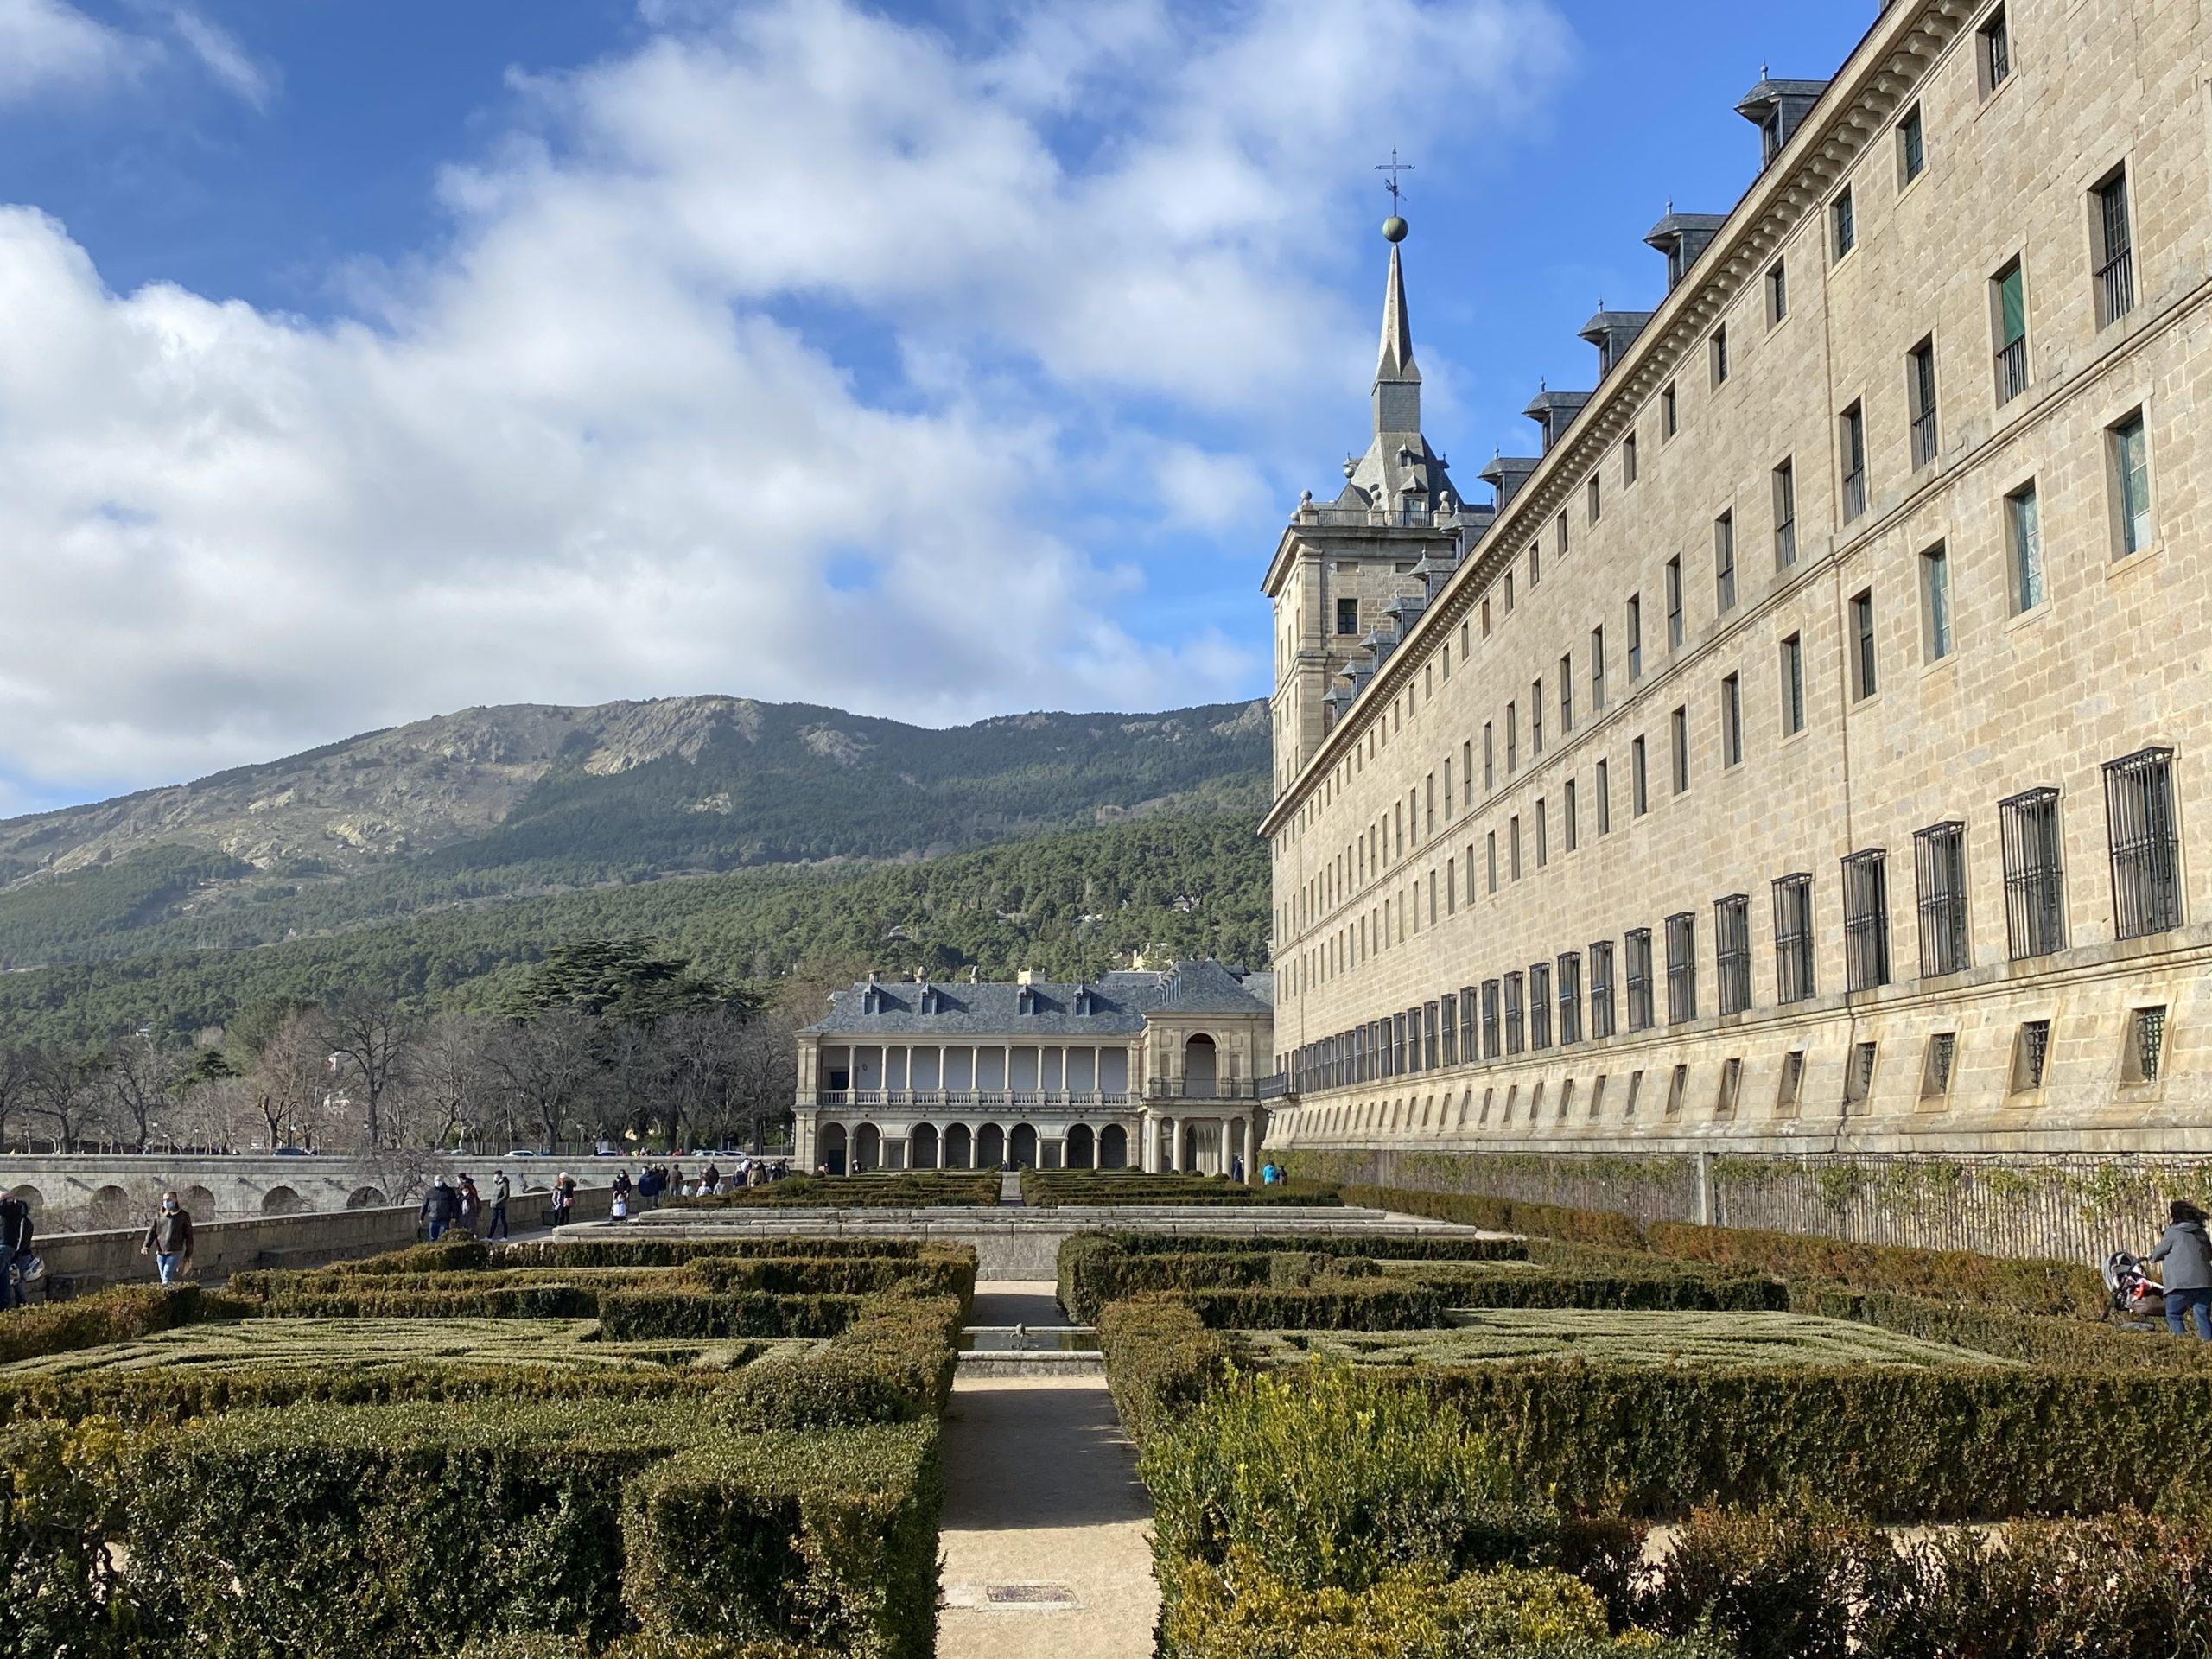 jardín-frailes-san-lorenzo-escorial